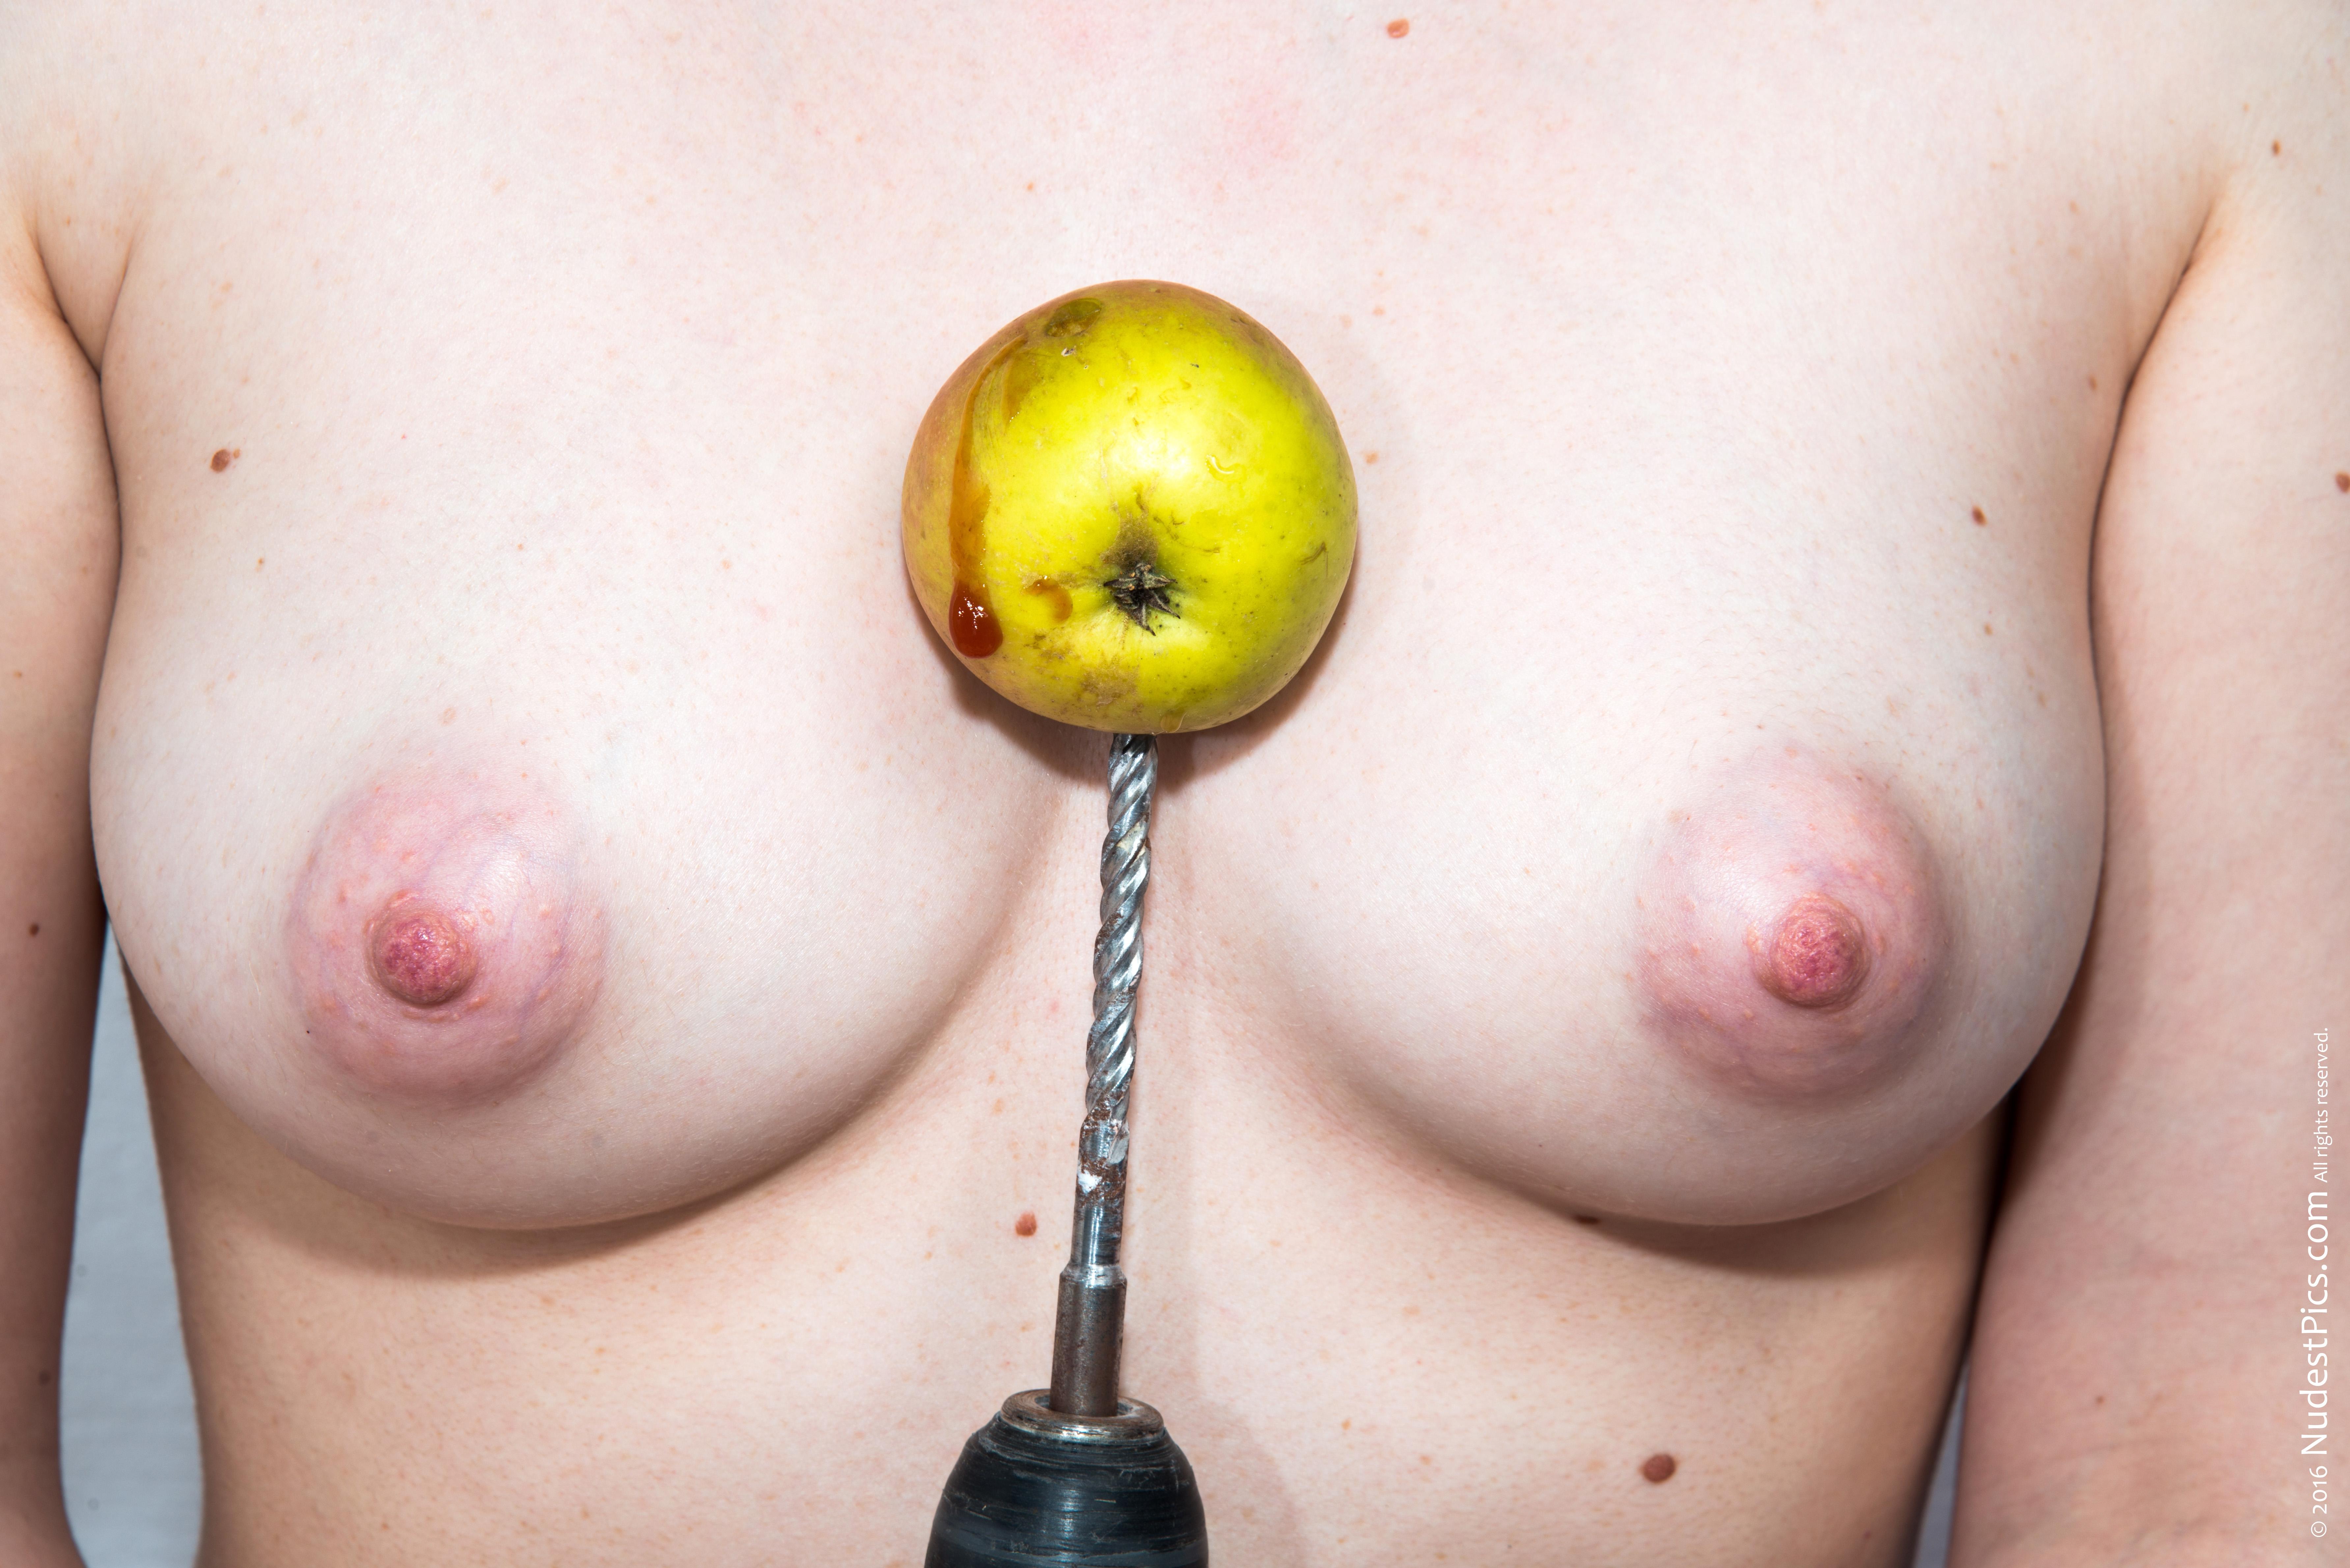 Killing an Apple on Breasts full HD